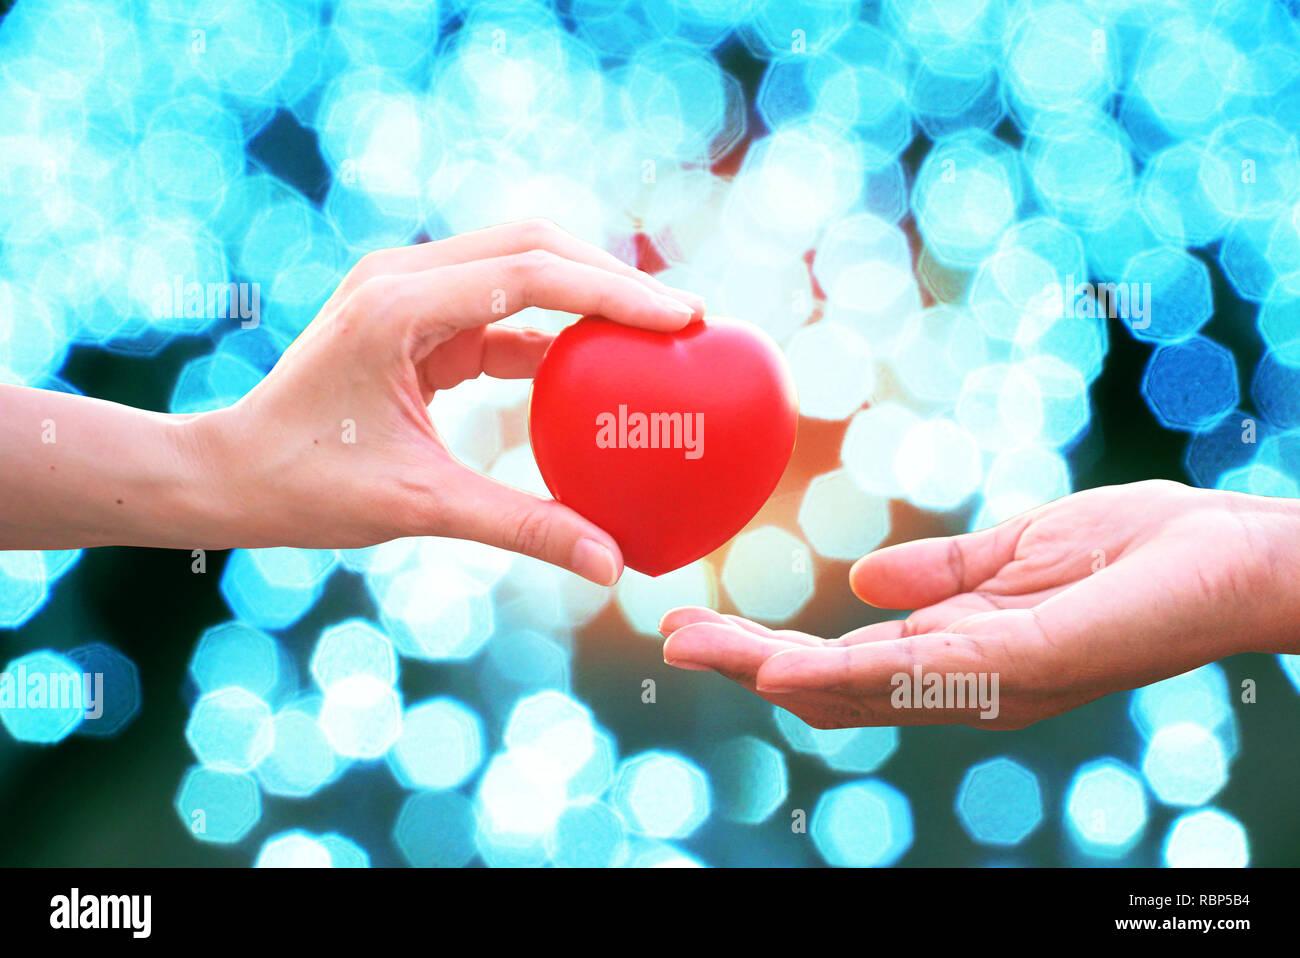 Amigo 's mano dar corazón rojo para alentar perdedor con sunset bokeh de fondo abstracto Imagen De Stock